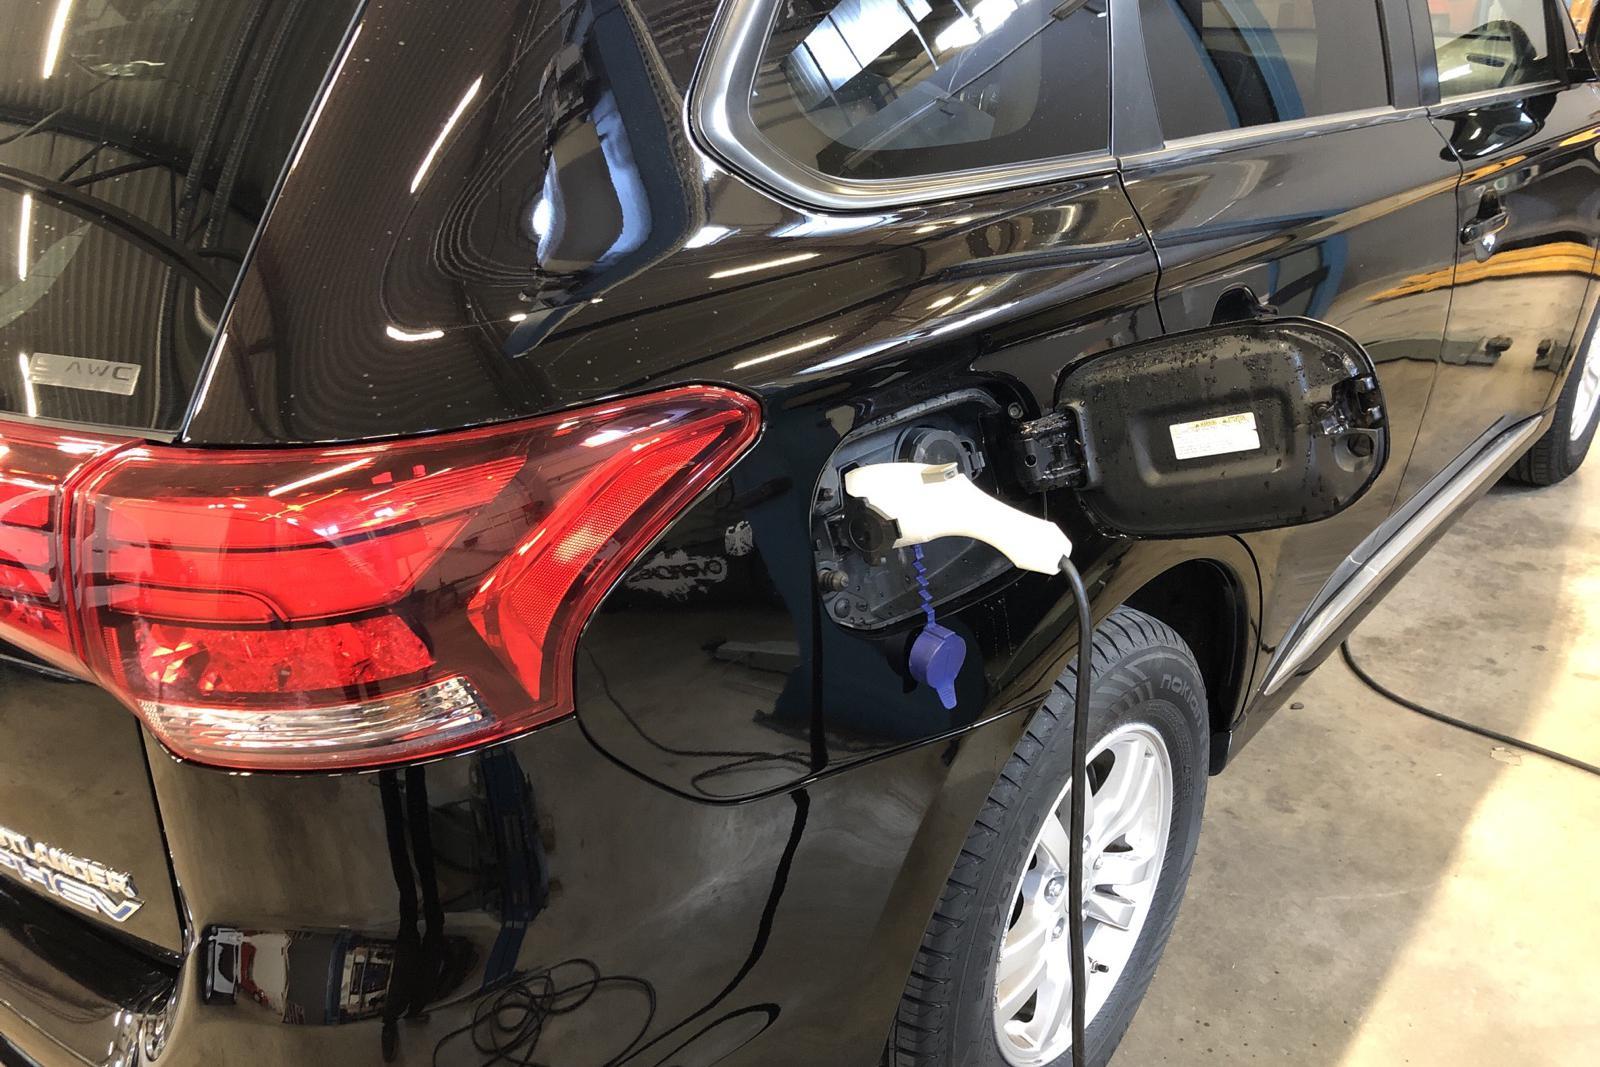 Mitsubishi Outlander 2.0 Plug-in Hybrid 4WD (121hk) - 11 506 mil - Automat - svart - 2017